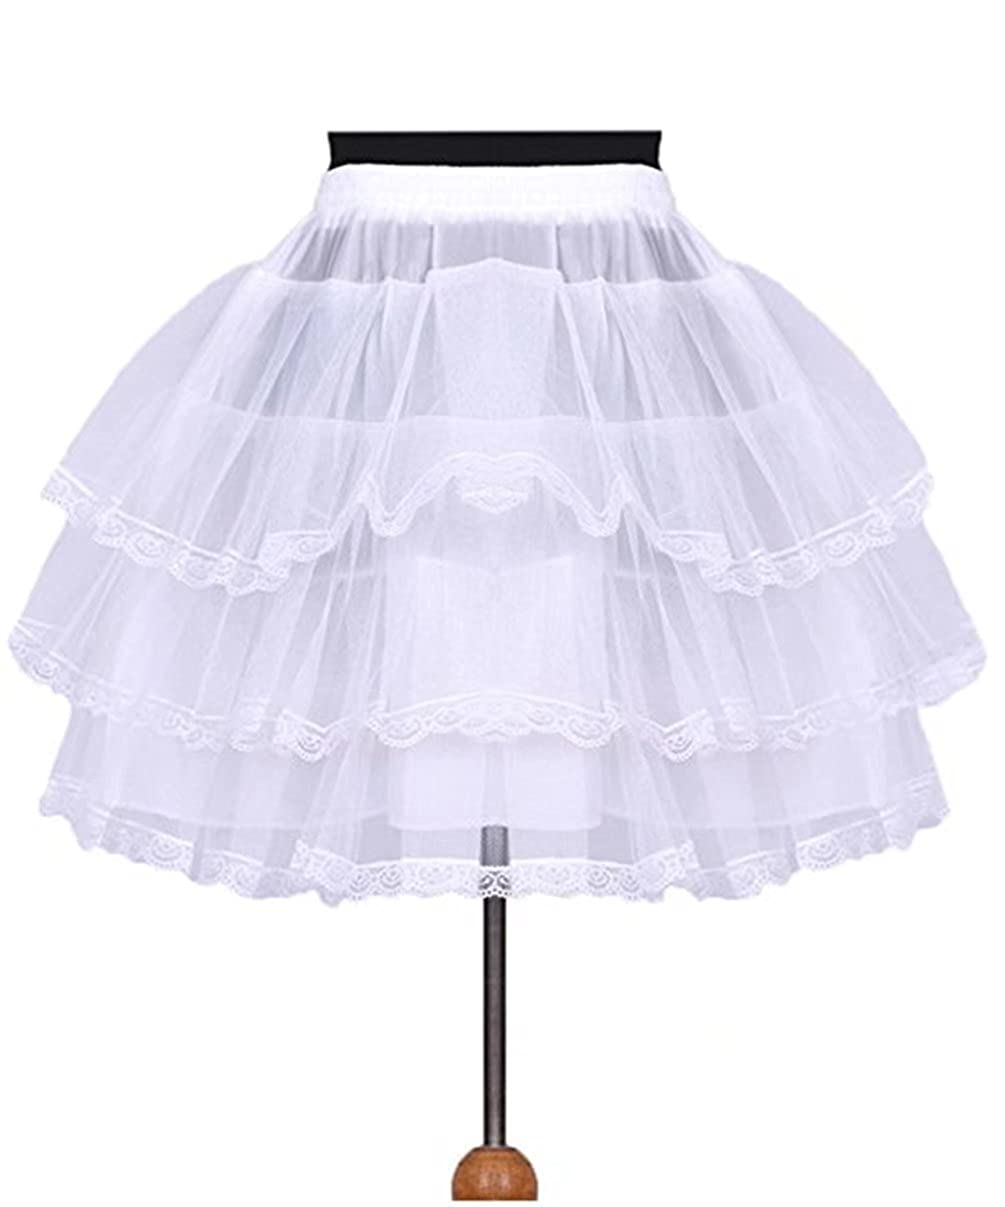 Sapphire Bridal Sab 3 Layer Lace Edge Short Peetticoat Hoopless Flower Grils Petticoat P33 SABP33-white